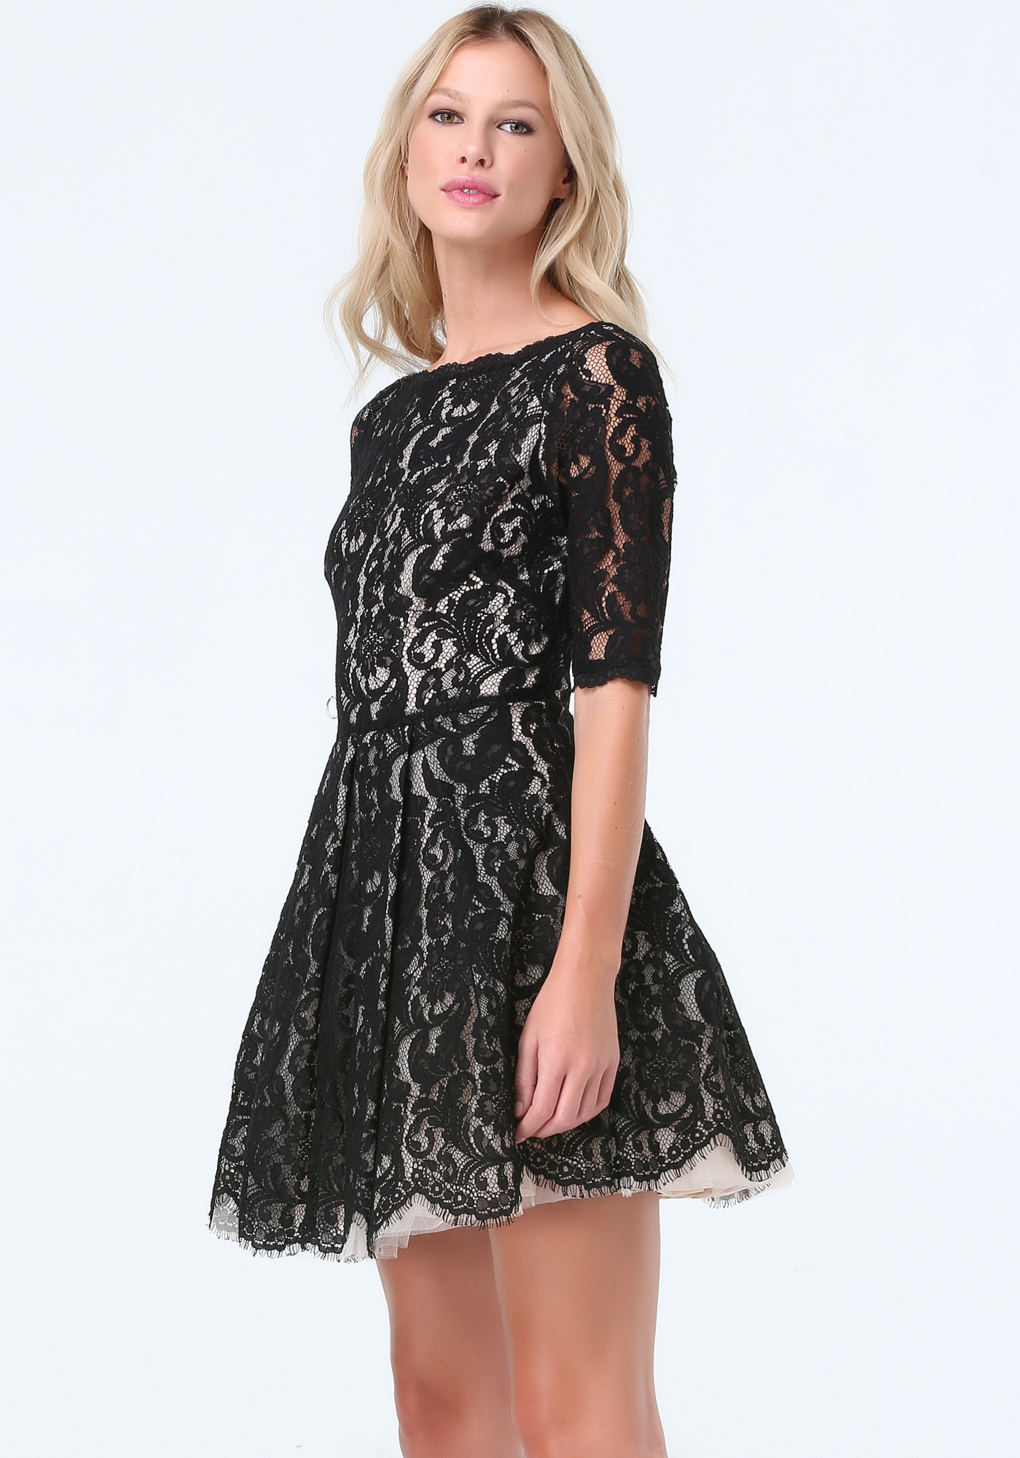 a2ba6add138 Lyst - Bebe Lace Fit   Flare Dress in Black